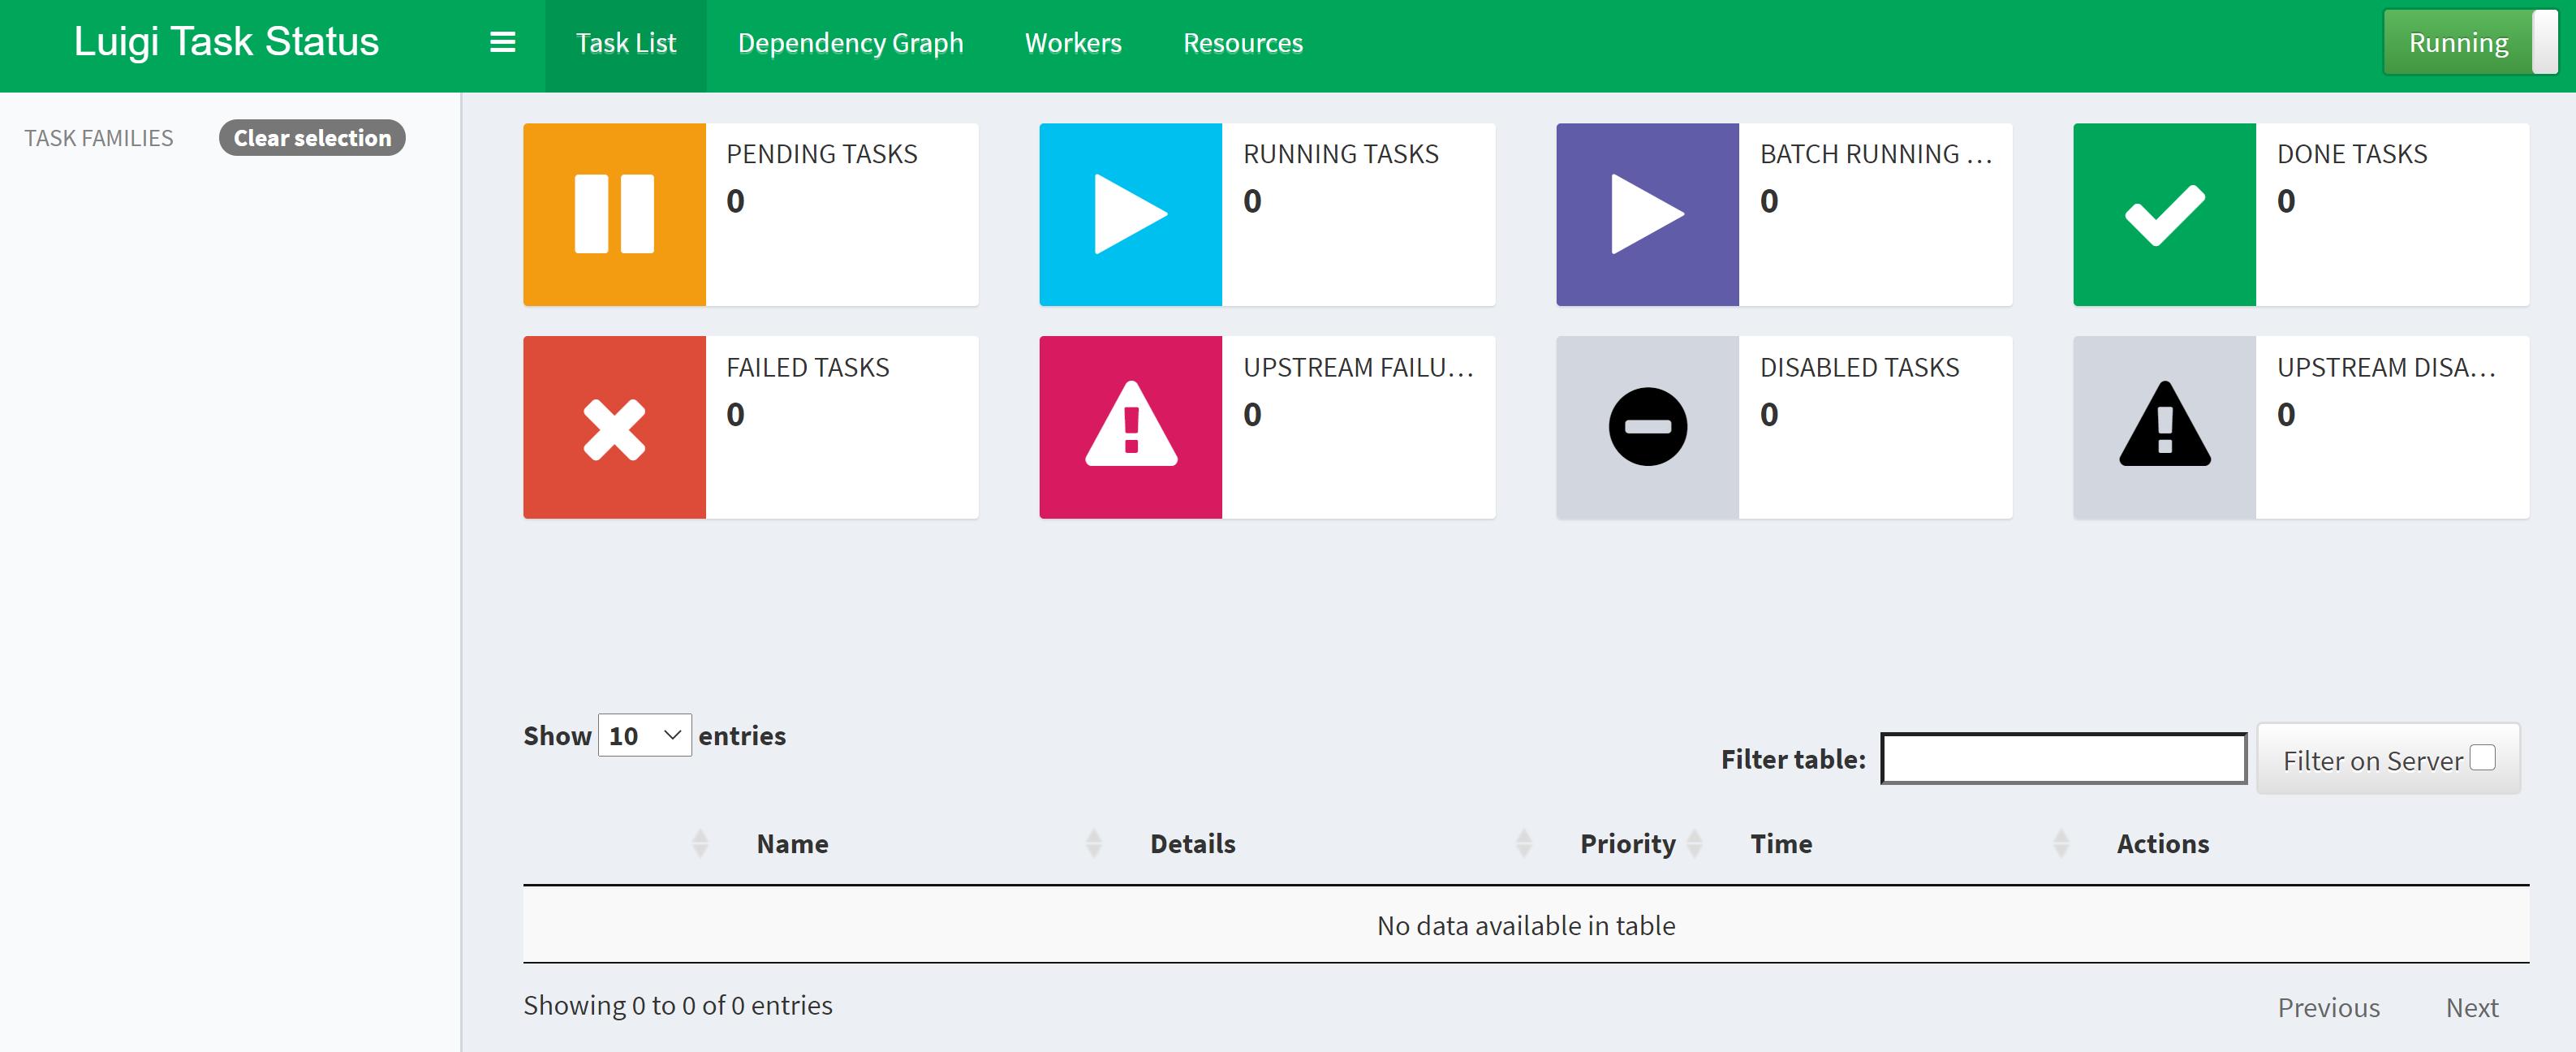 Luigi default user interface